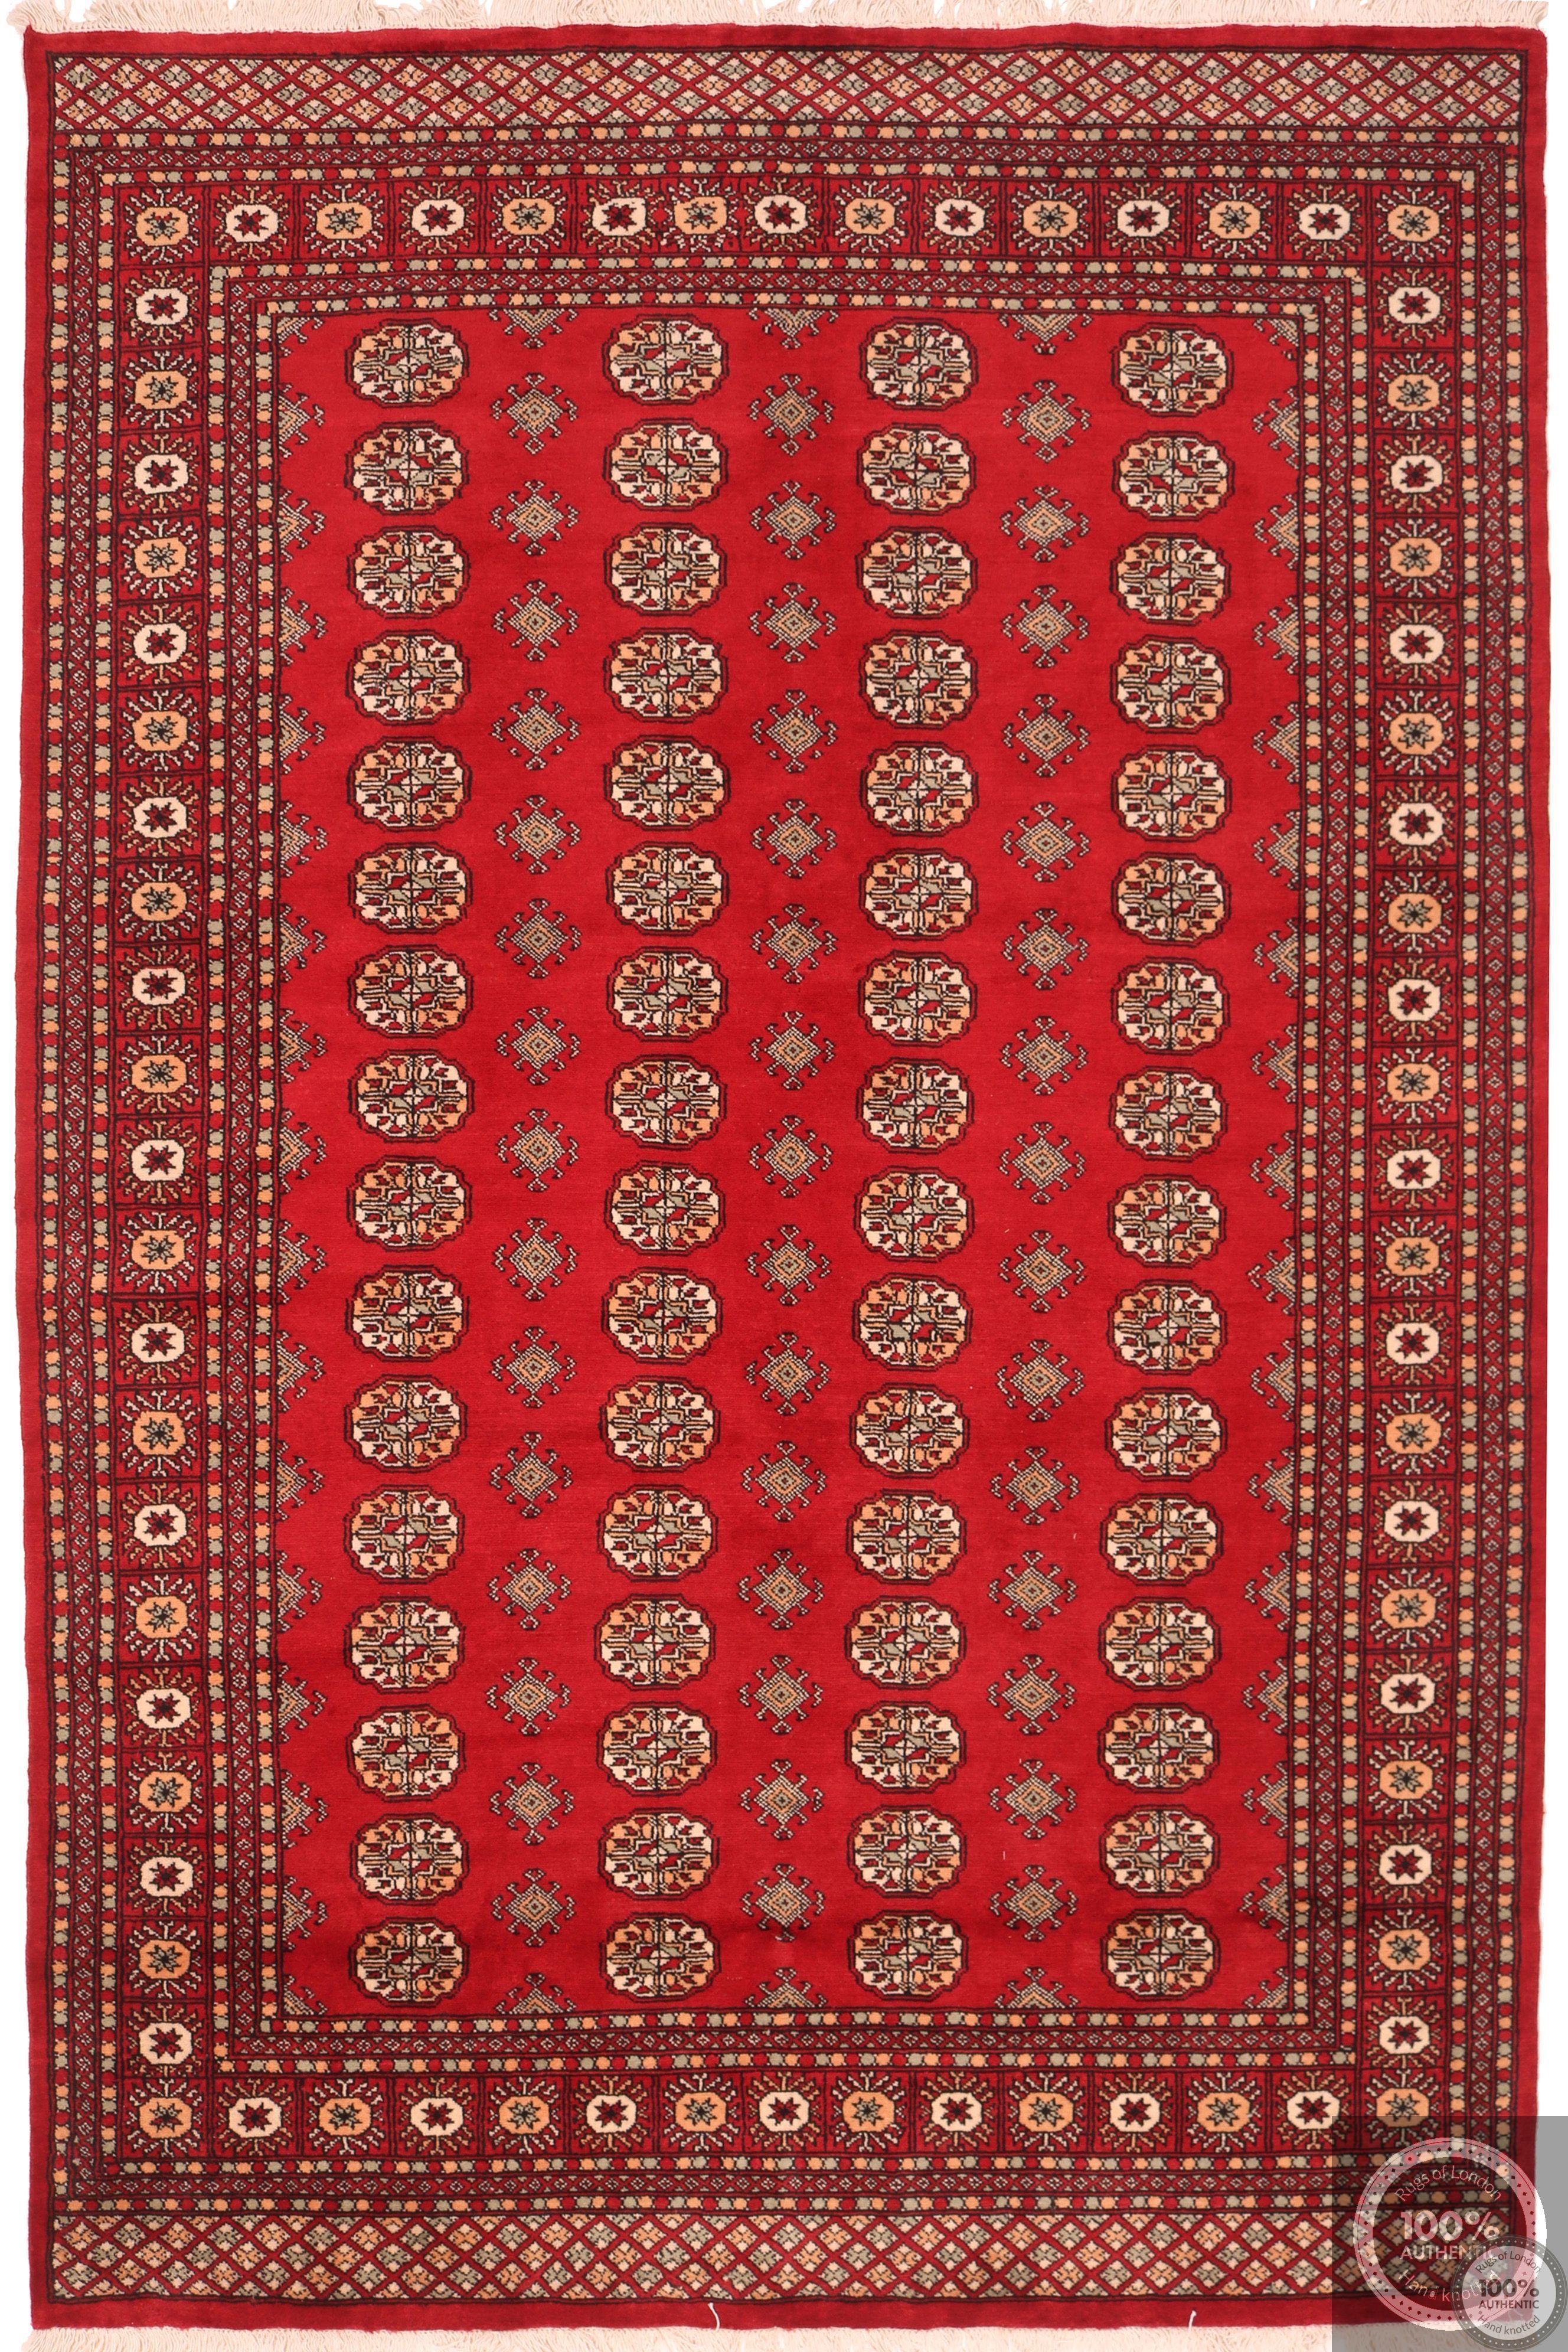 Bokhara design rug - red